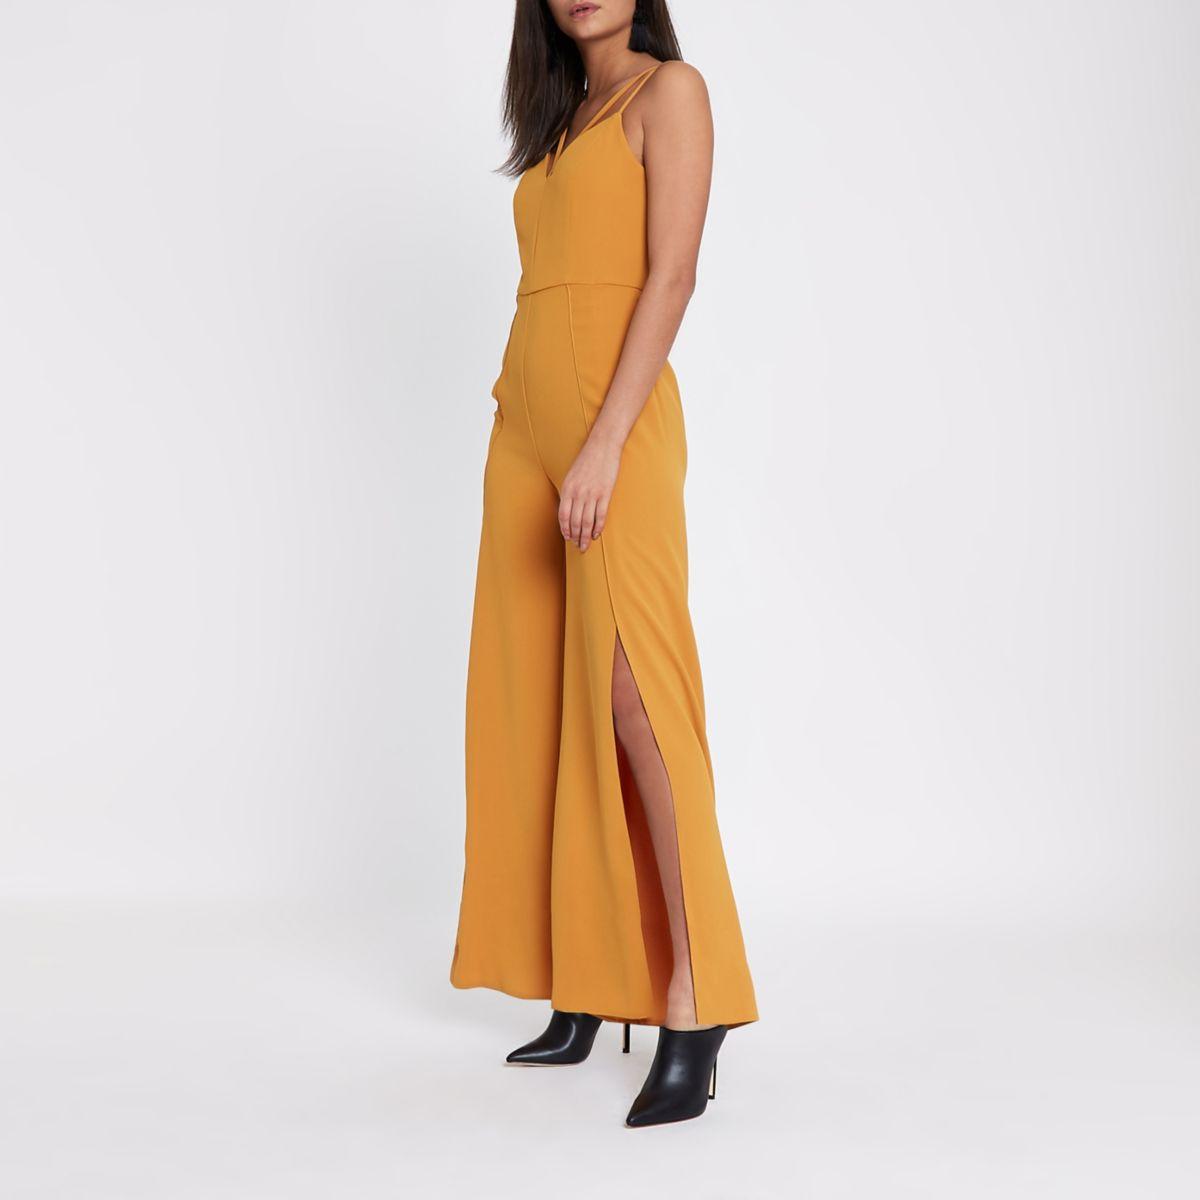 Mustard yellow wide split leg cami jumpsuit